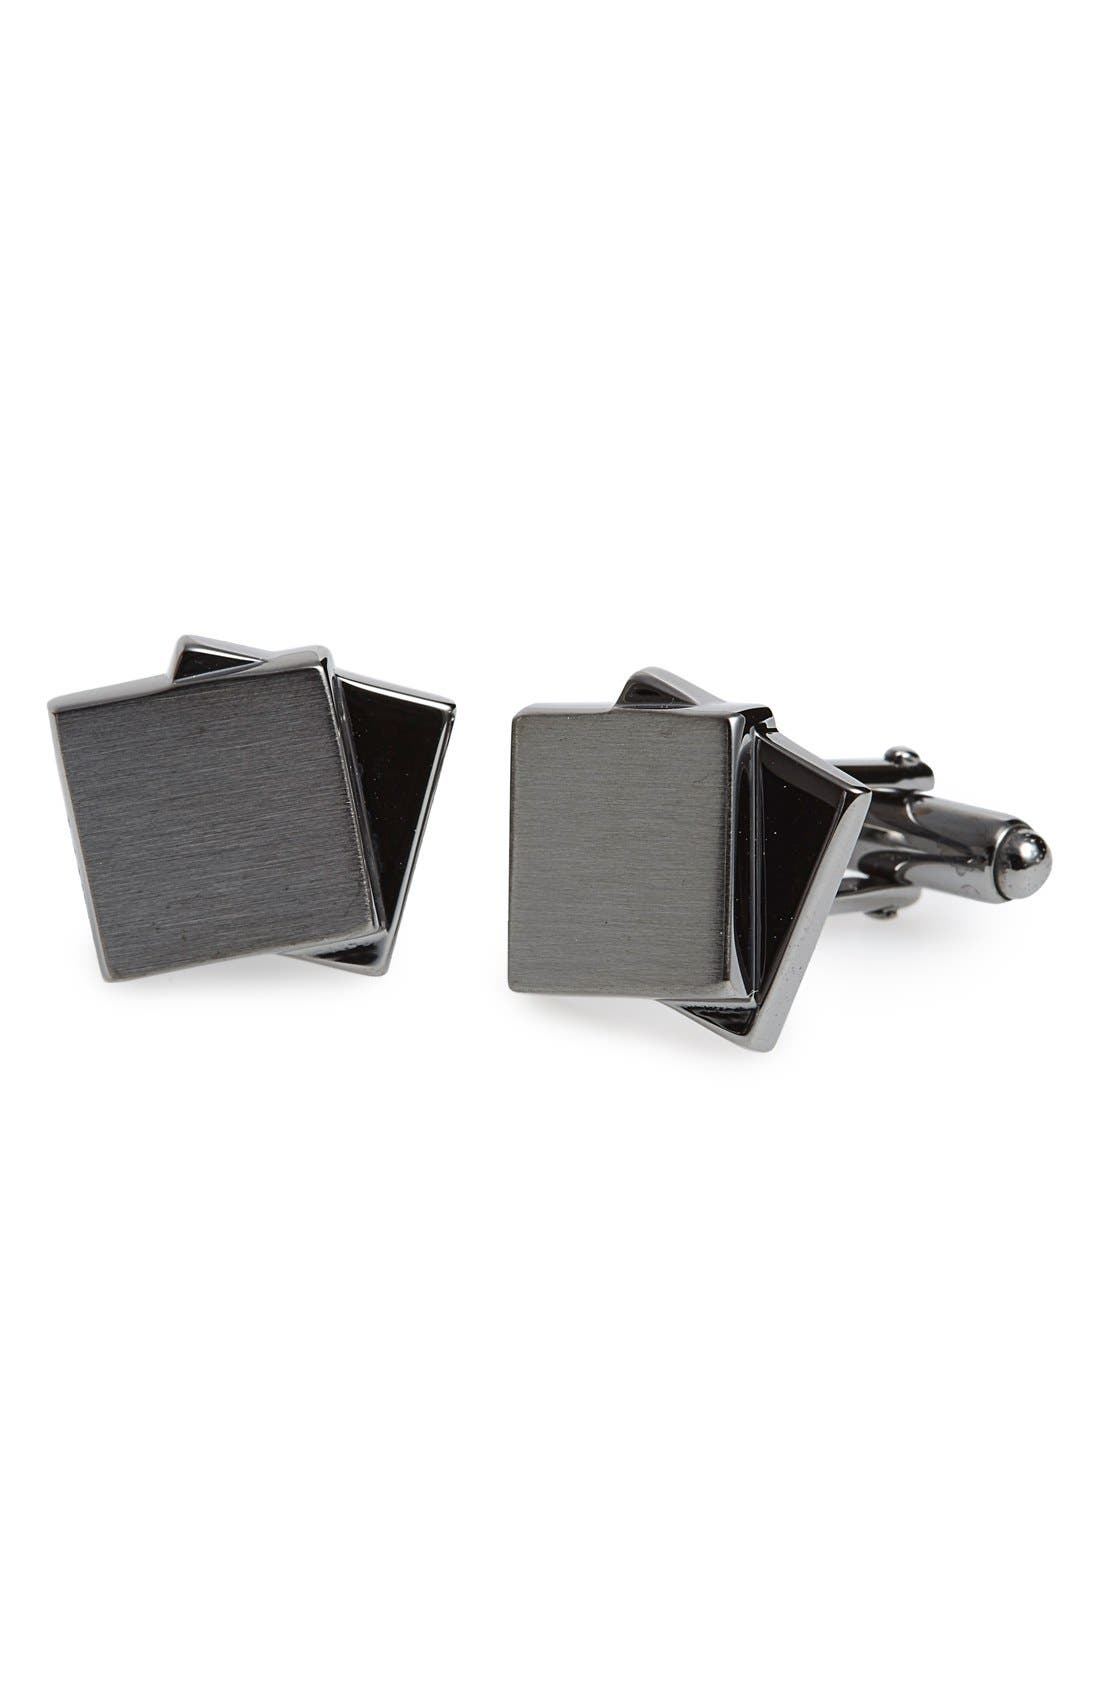 Dual Plaques Cuff Links,                         Main,                         color, Gunmetal